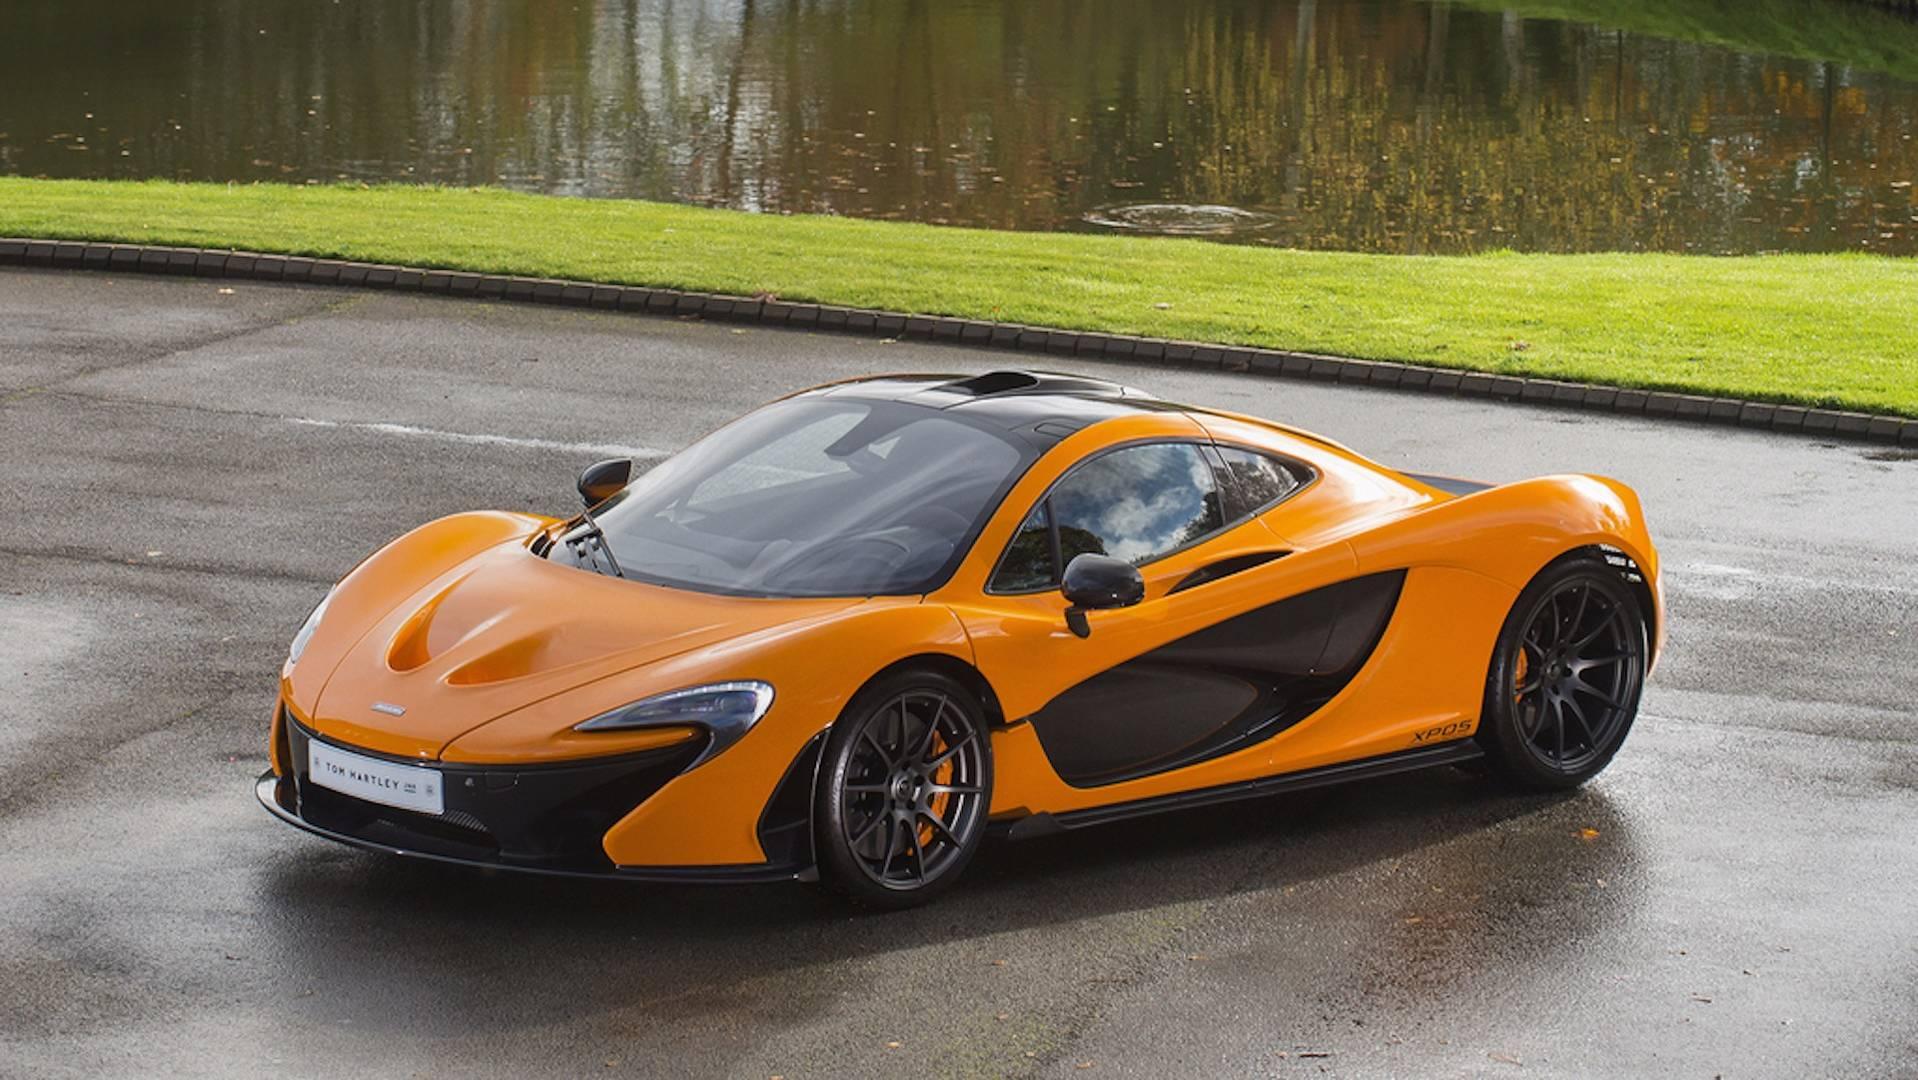 McLaren_P1_Experimental_Prototype_02